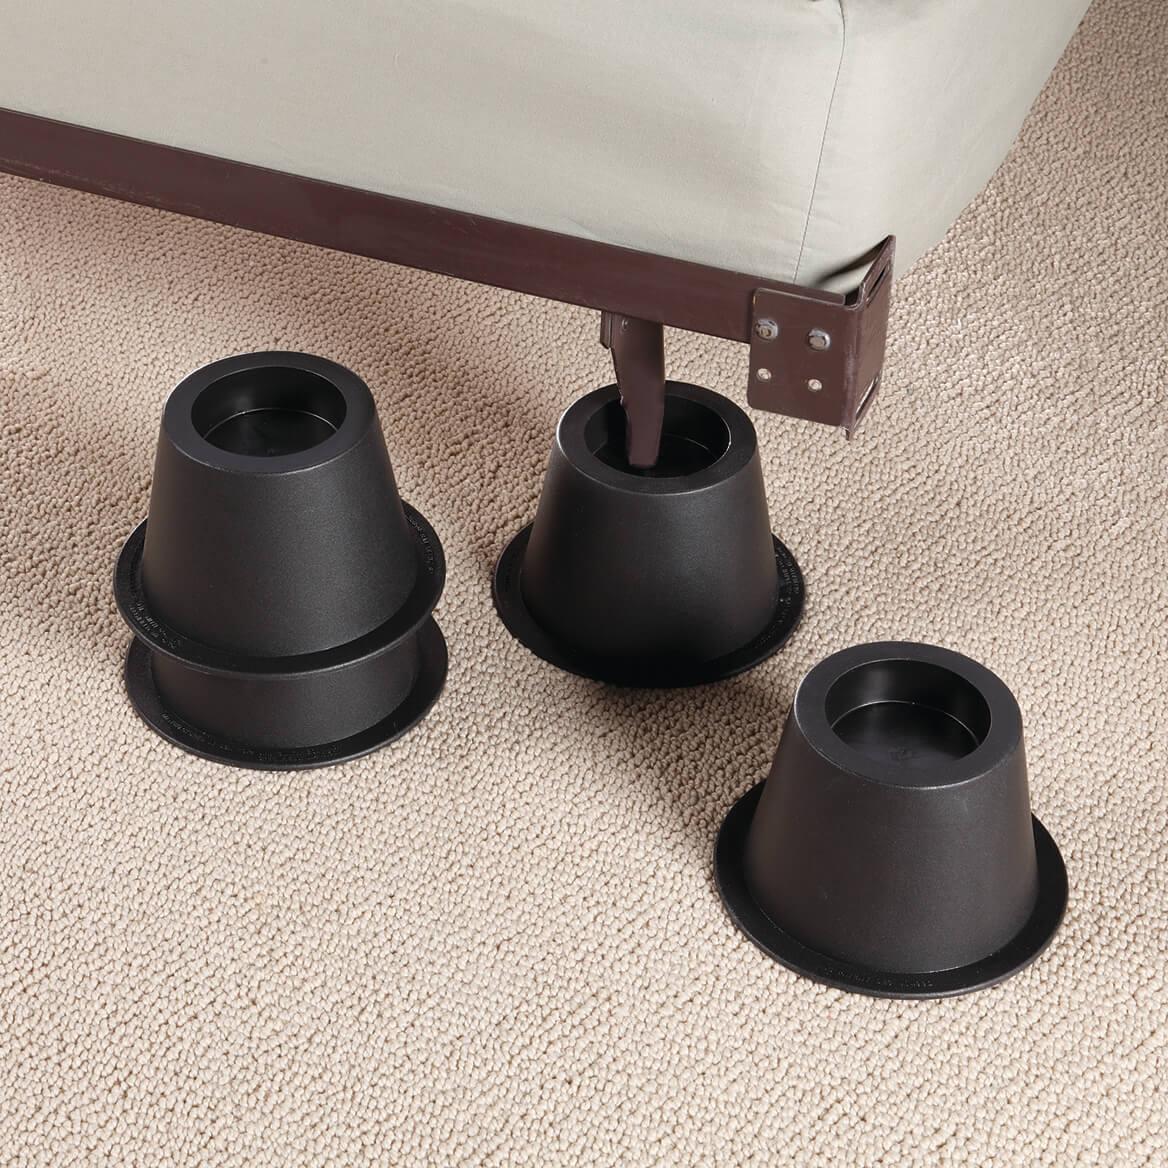 Terrific Black Bed Risers Set Of 4 Machost Co Dining Chair Design Ideas Machostcouk